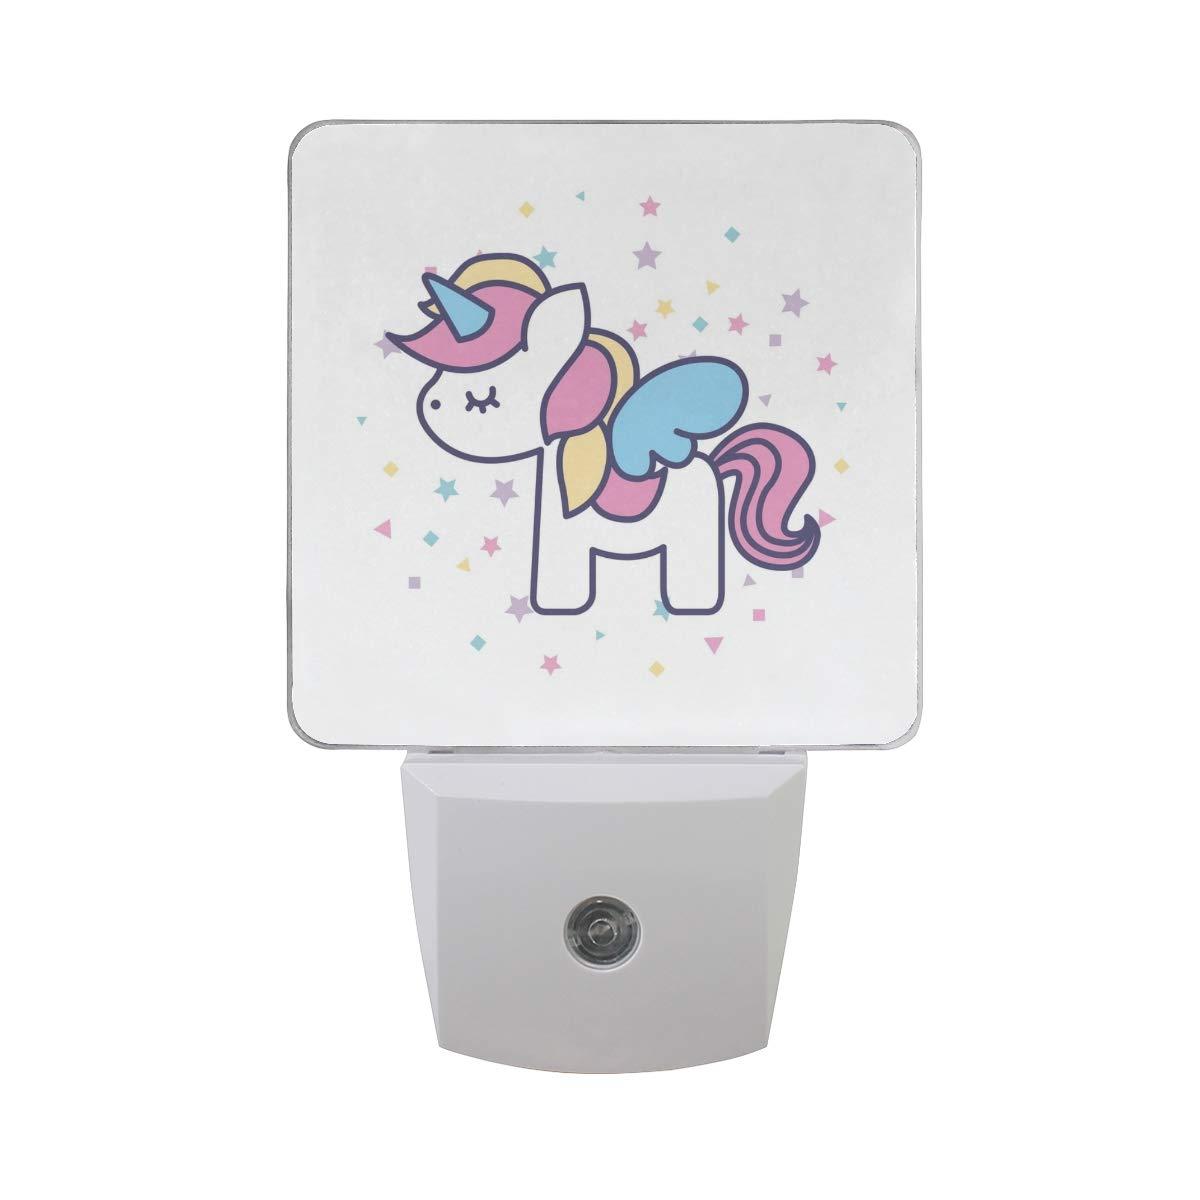 Suabo plug in led night light lamp dusk to dawn light sensor for bedroom hallway wall light with drawing unicorn design 0 5w 2 pack amazon com